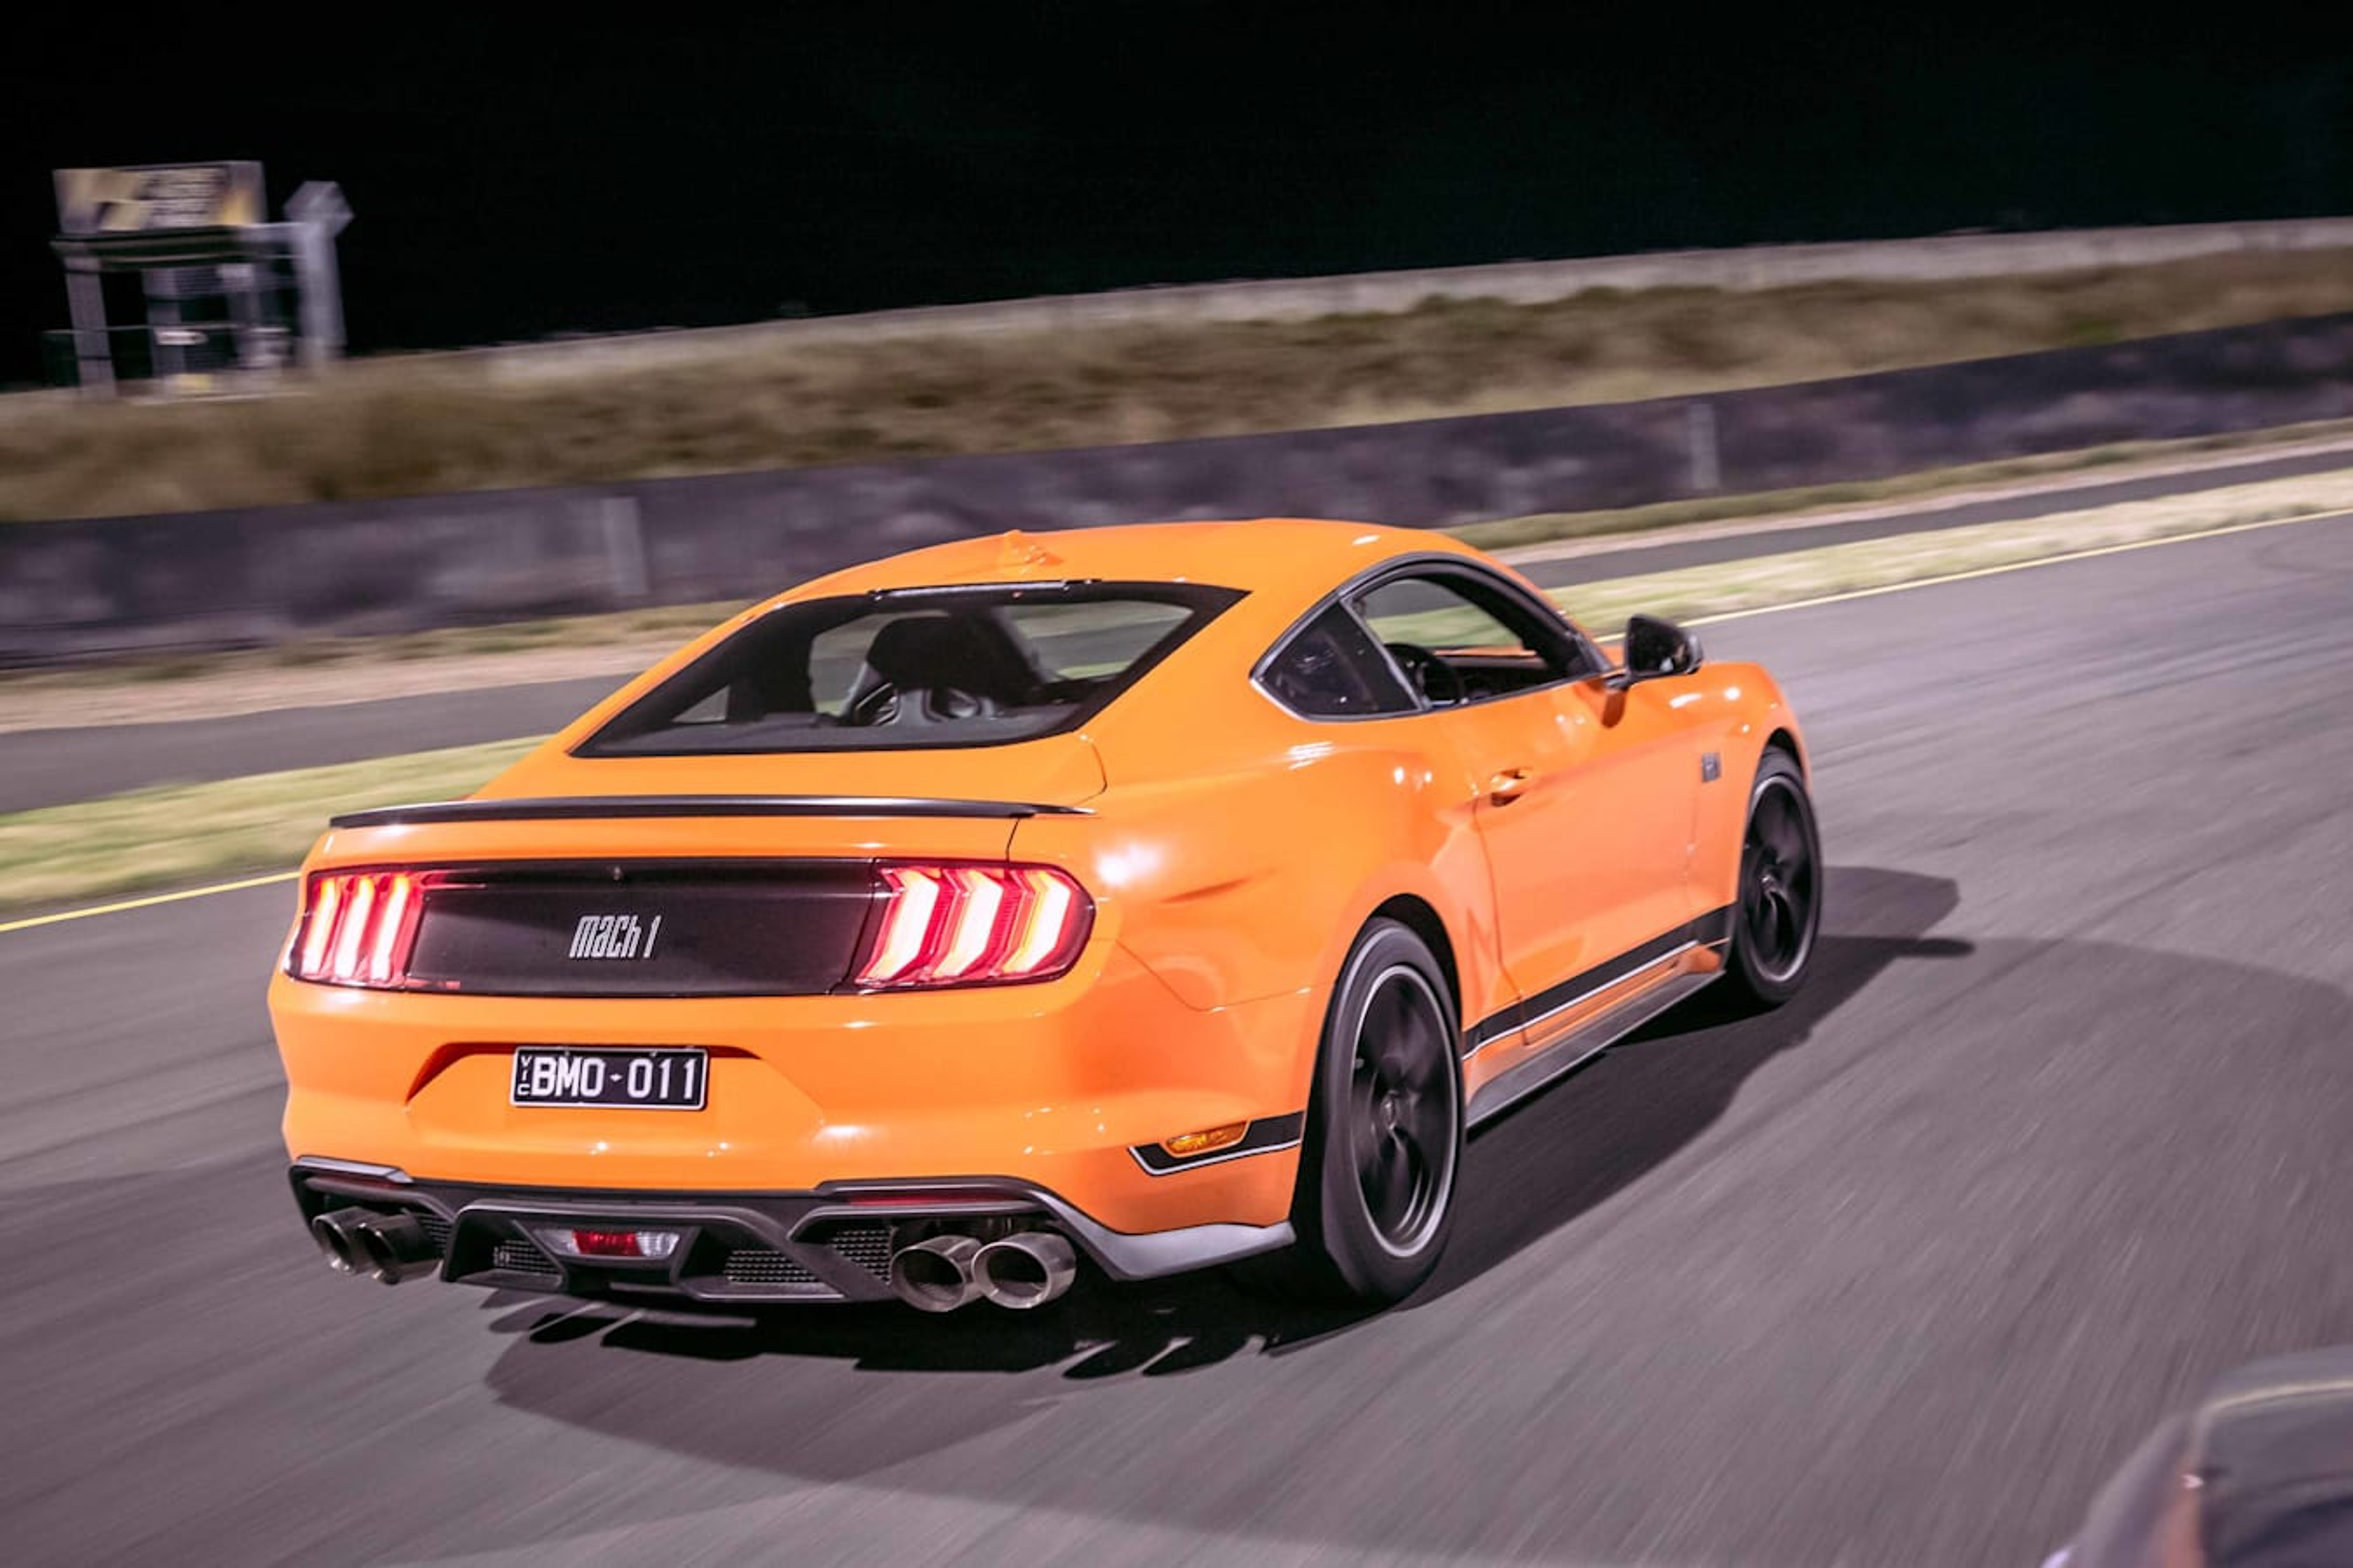 Motor Mustang Mach 1 30